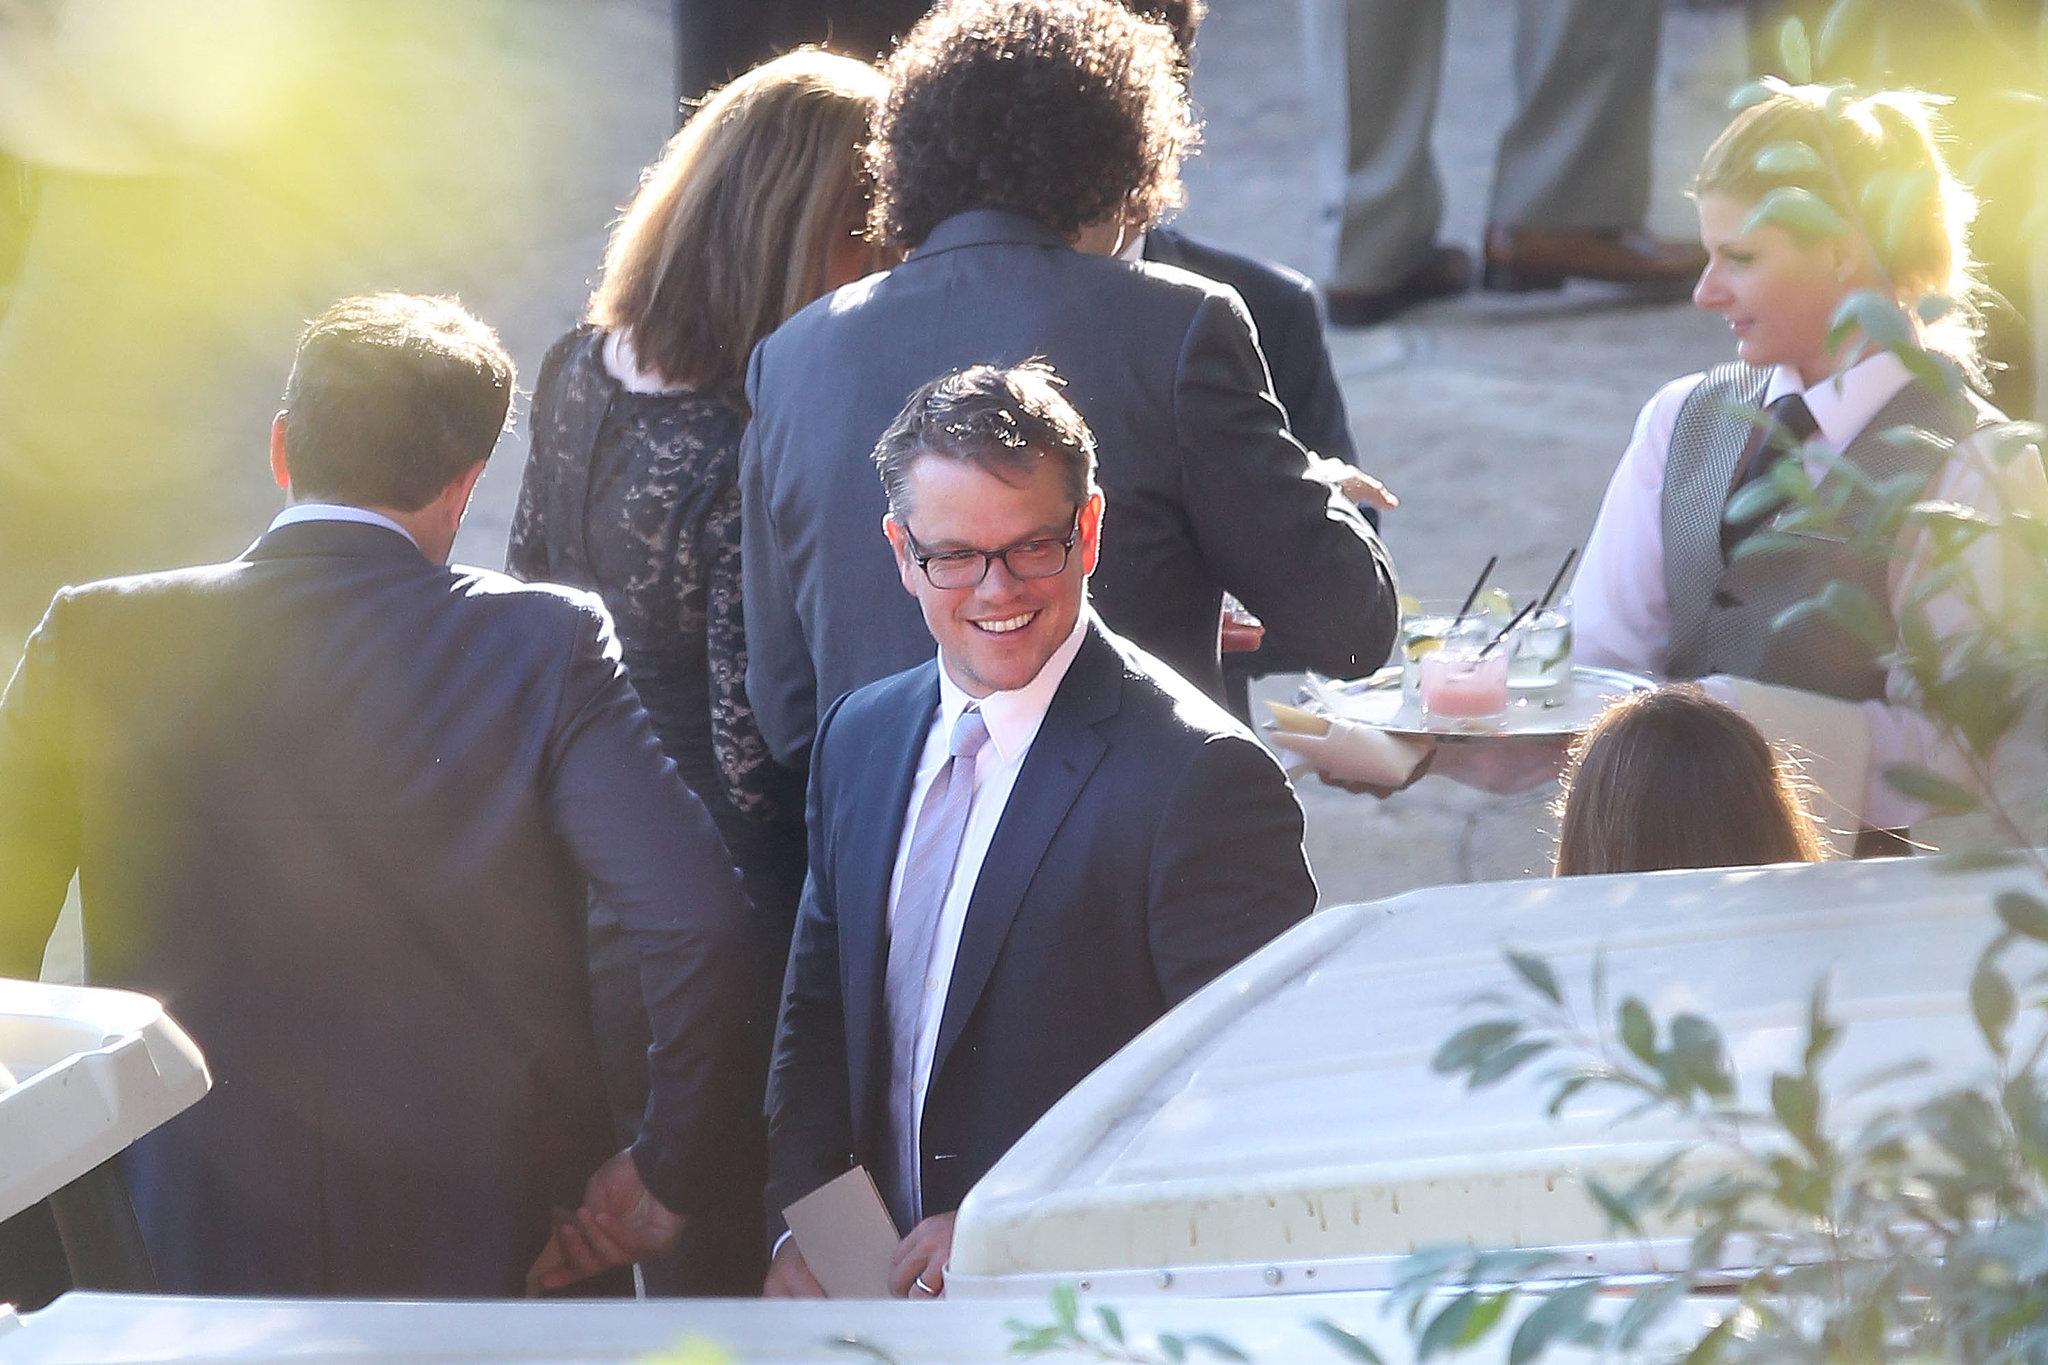 Matt Damon attended Jimmy Kimmel's July 2013 wedding in Ojai, CA.